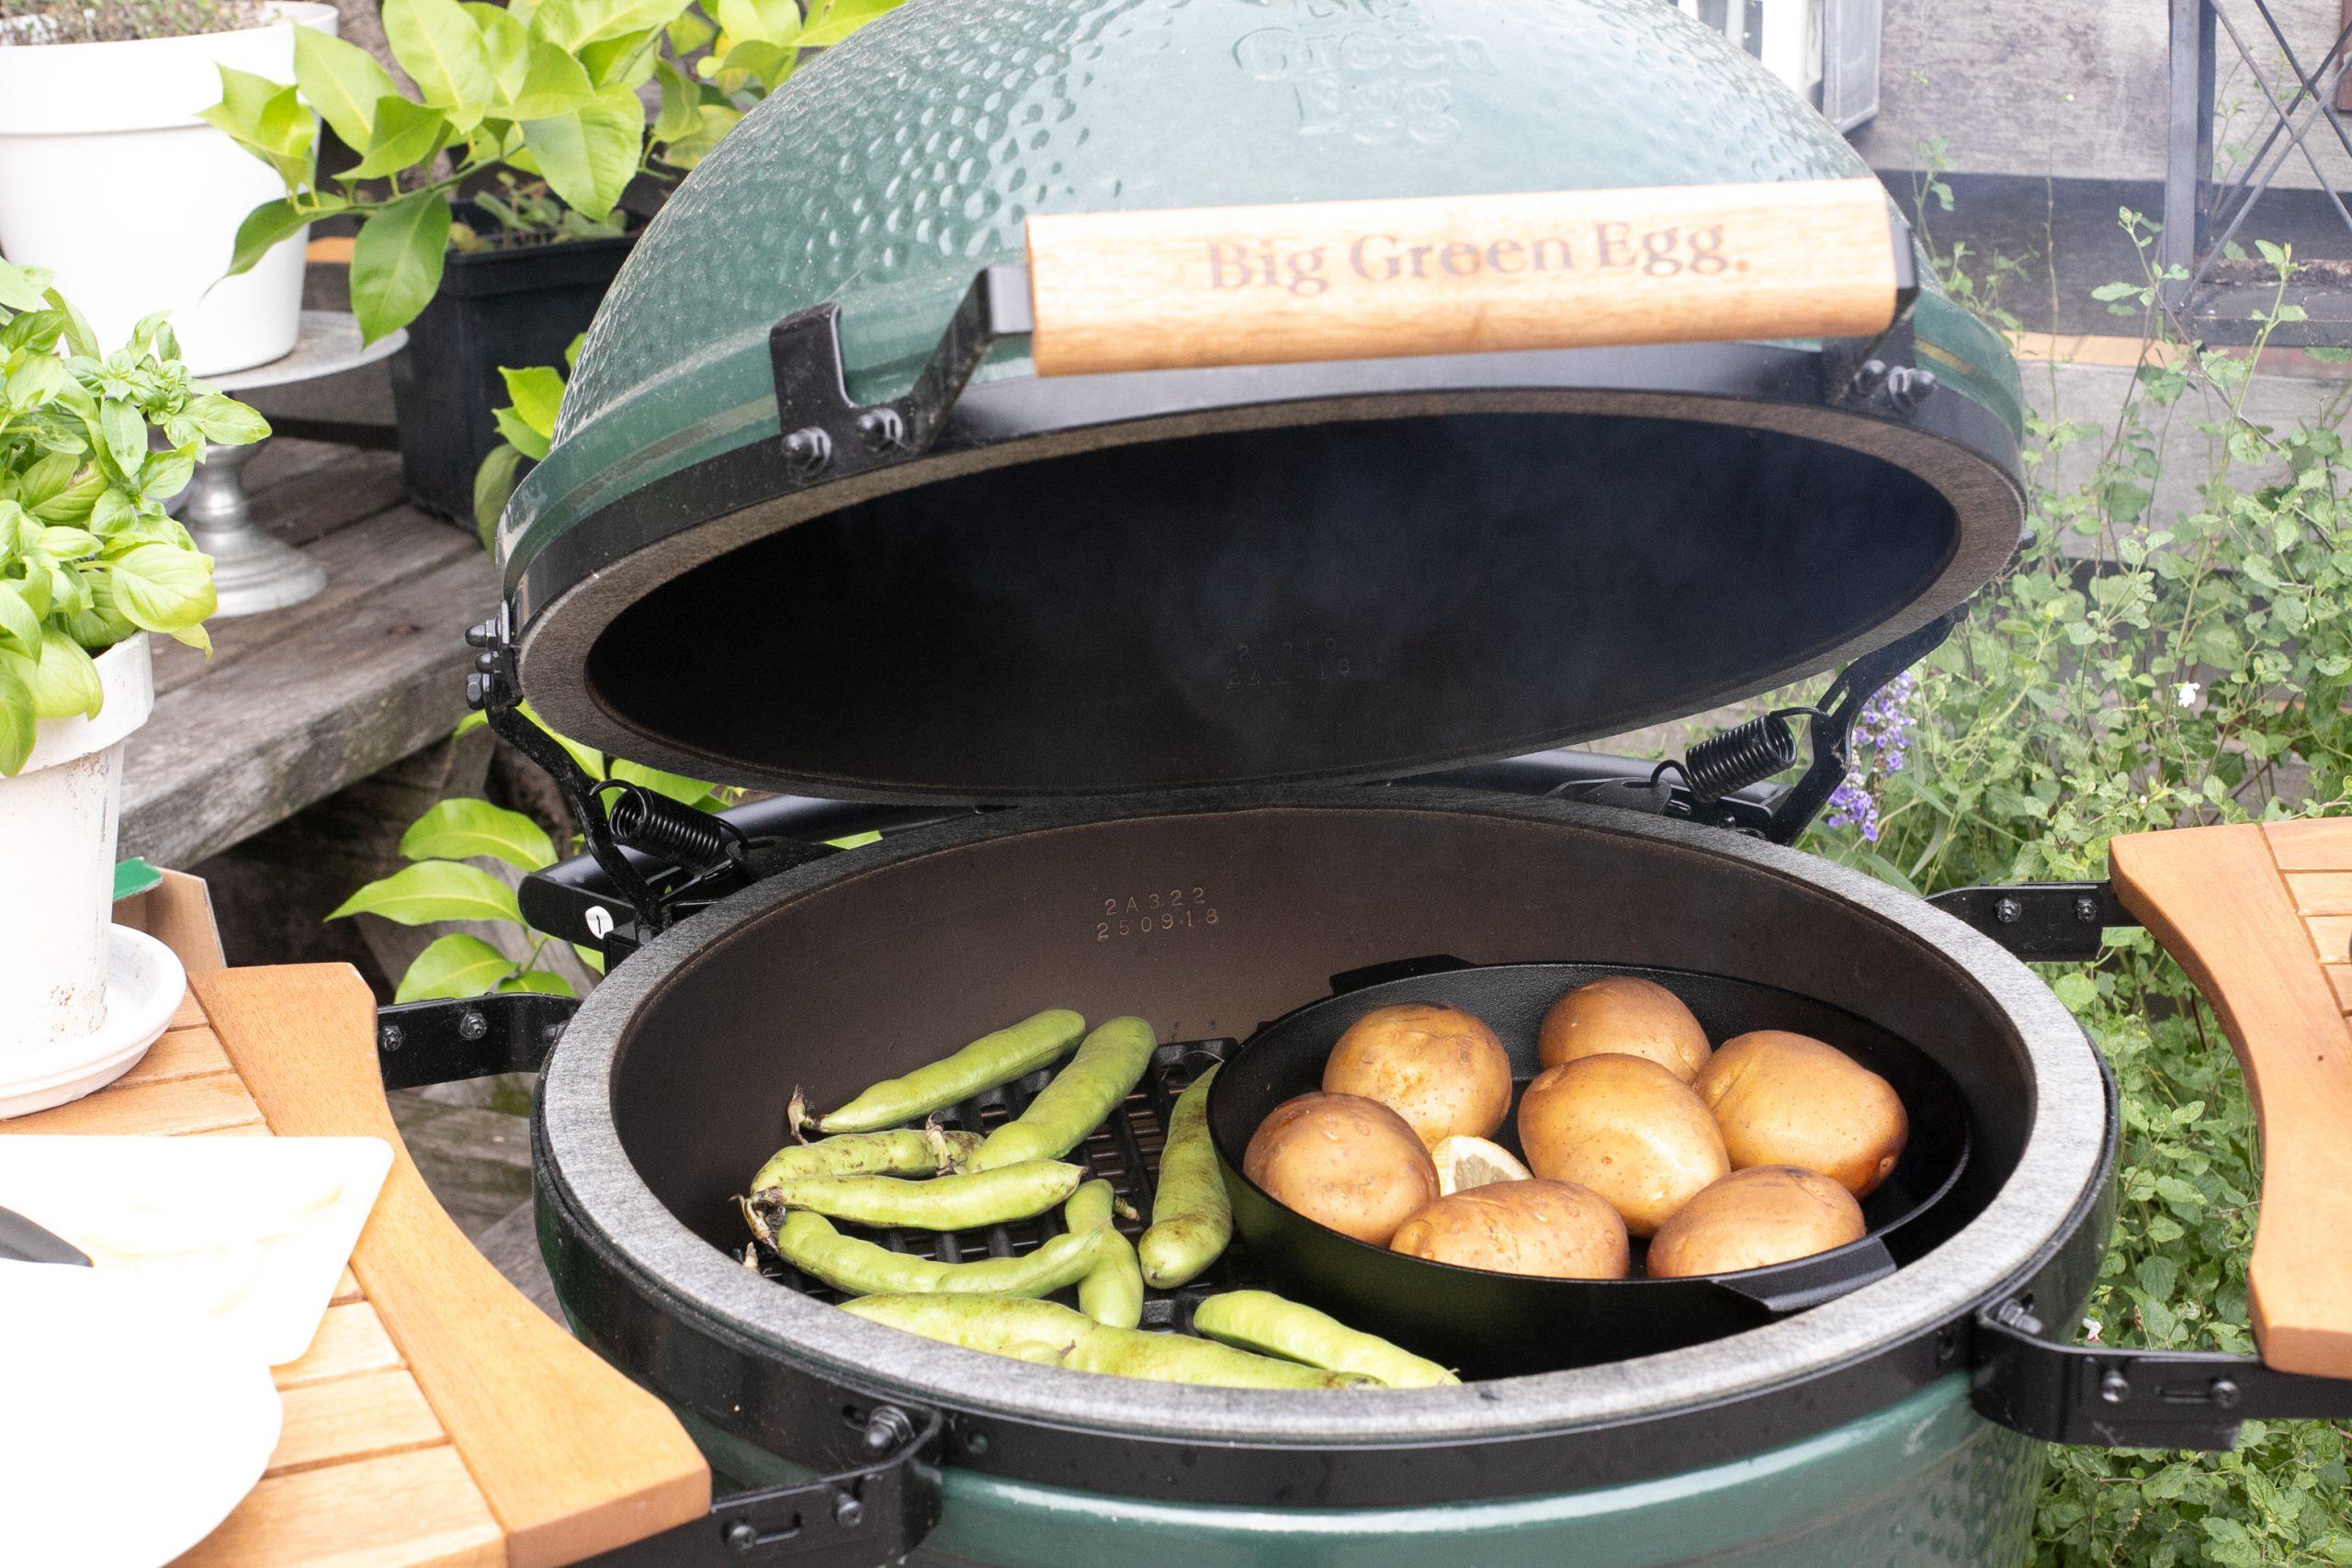 Gepofte aardappels van de Big Green EGG met crème fraîche & avocado